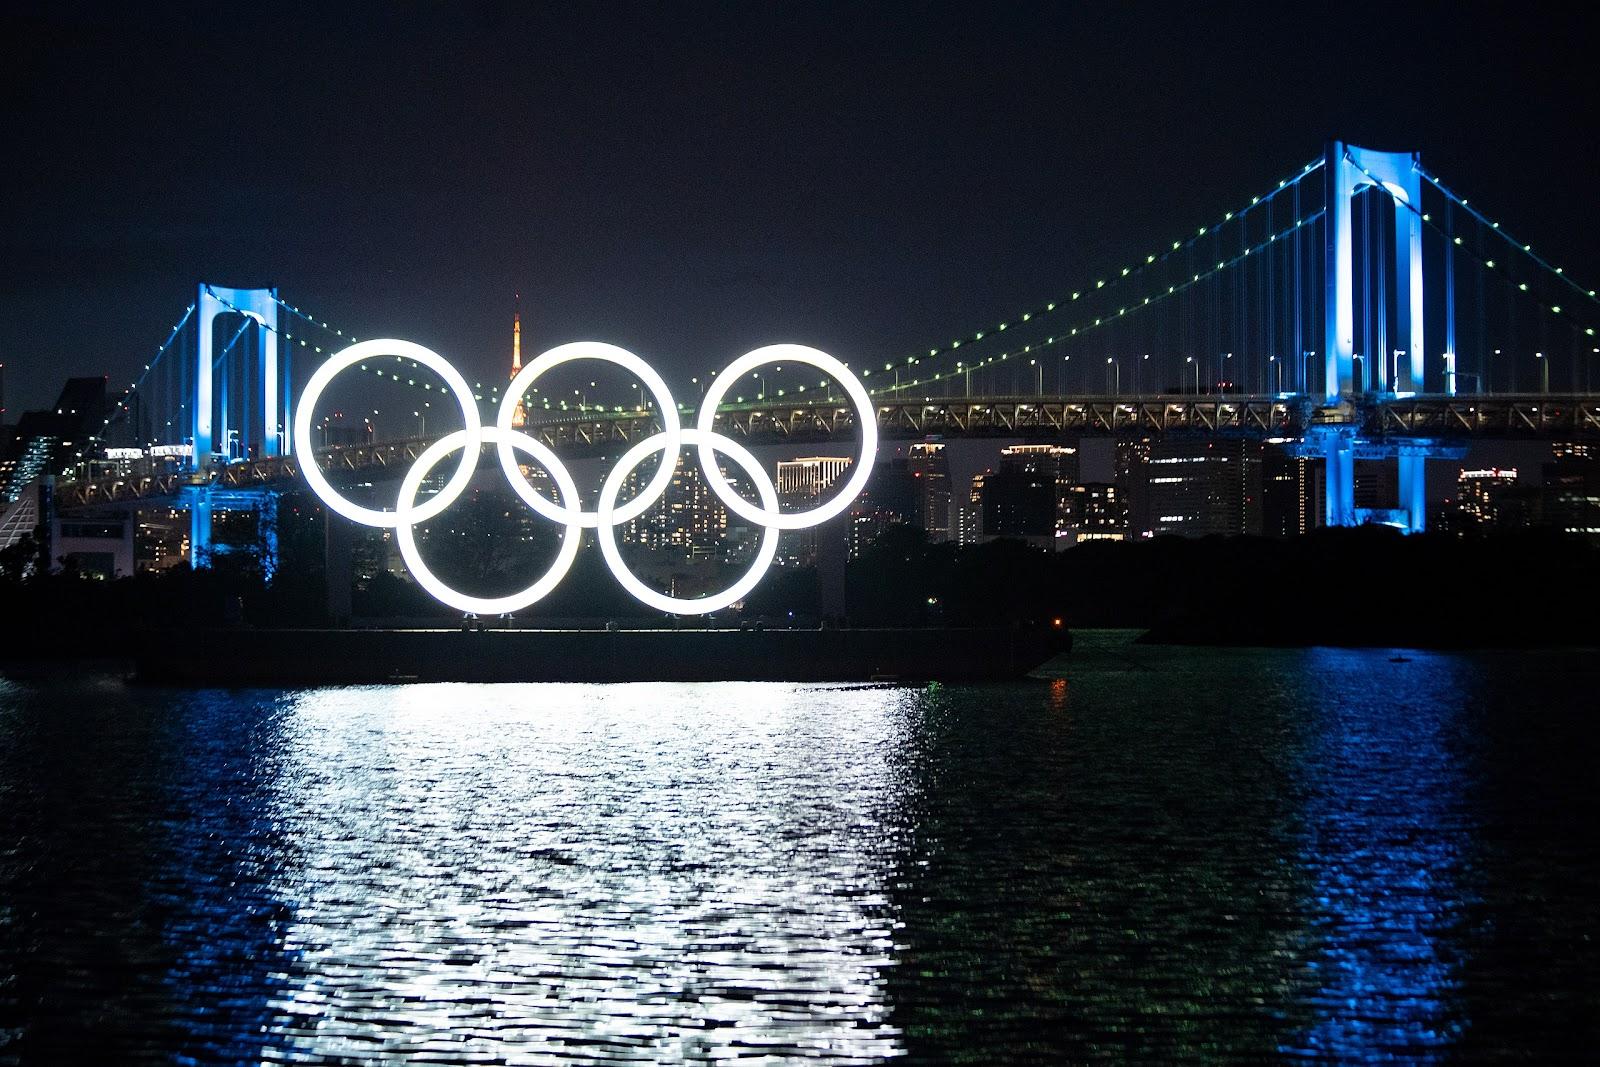 Olympic rings on bridge overlooking Hong Kong river